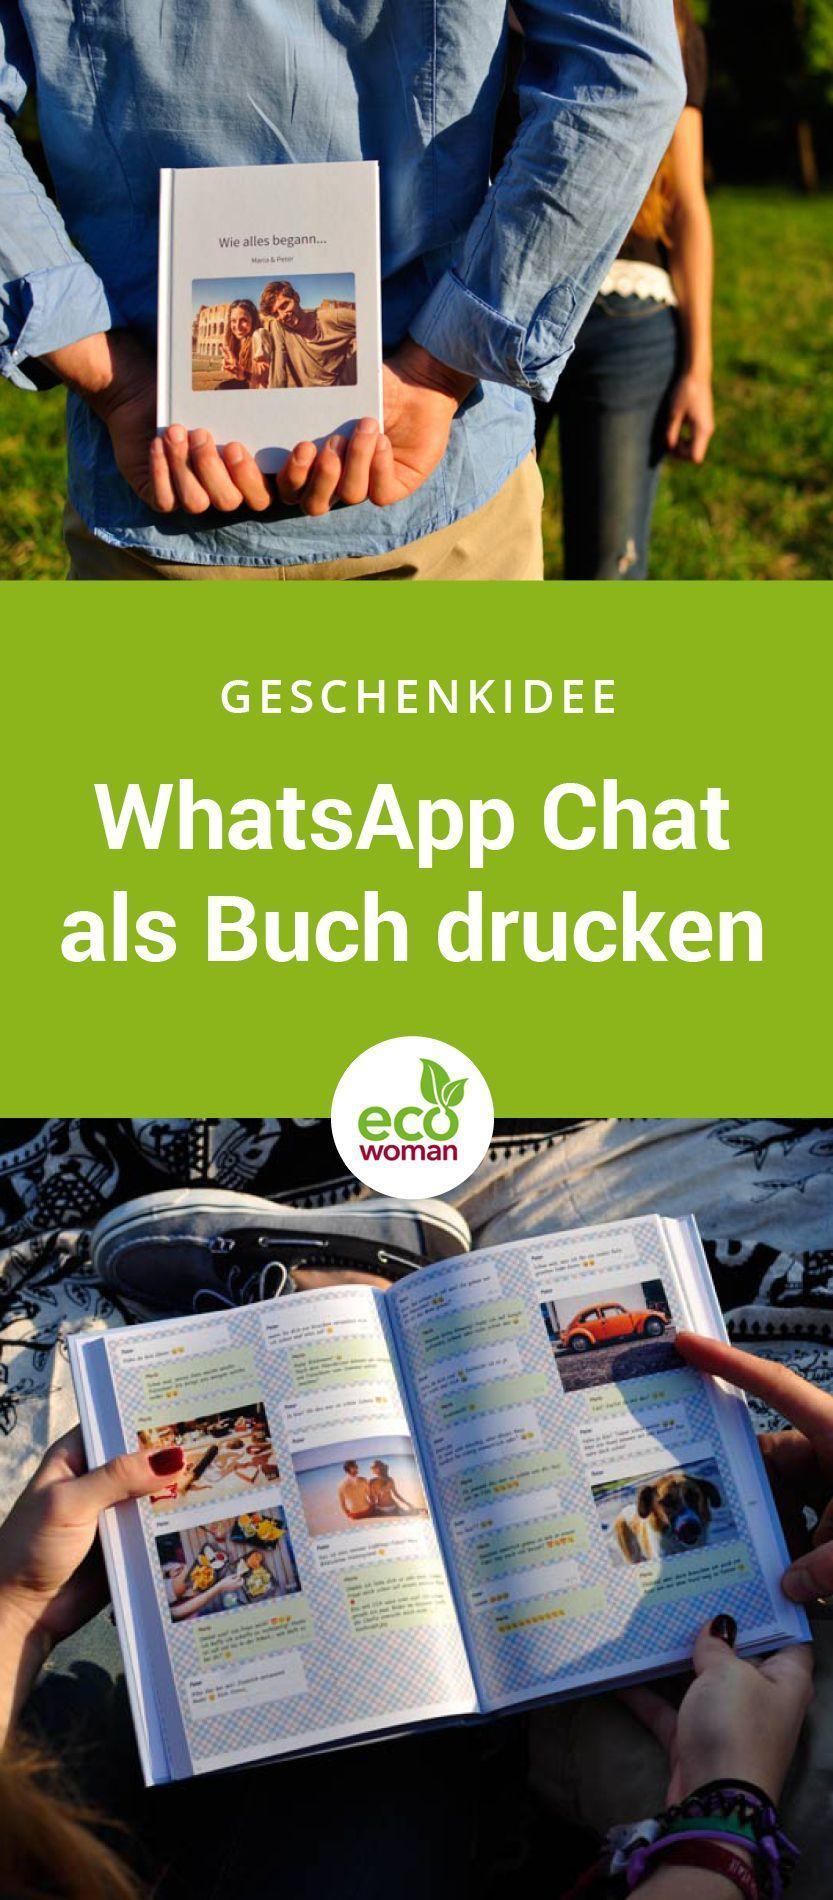 Geniales Geschenk Whatsapp Chat Als Buch Drucken Als Buch Chat Drucken Geniales Gesche In 2020 Diy Gifts For Kids Diy Gifts For Boyfriend Diy Father S Day Gifts